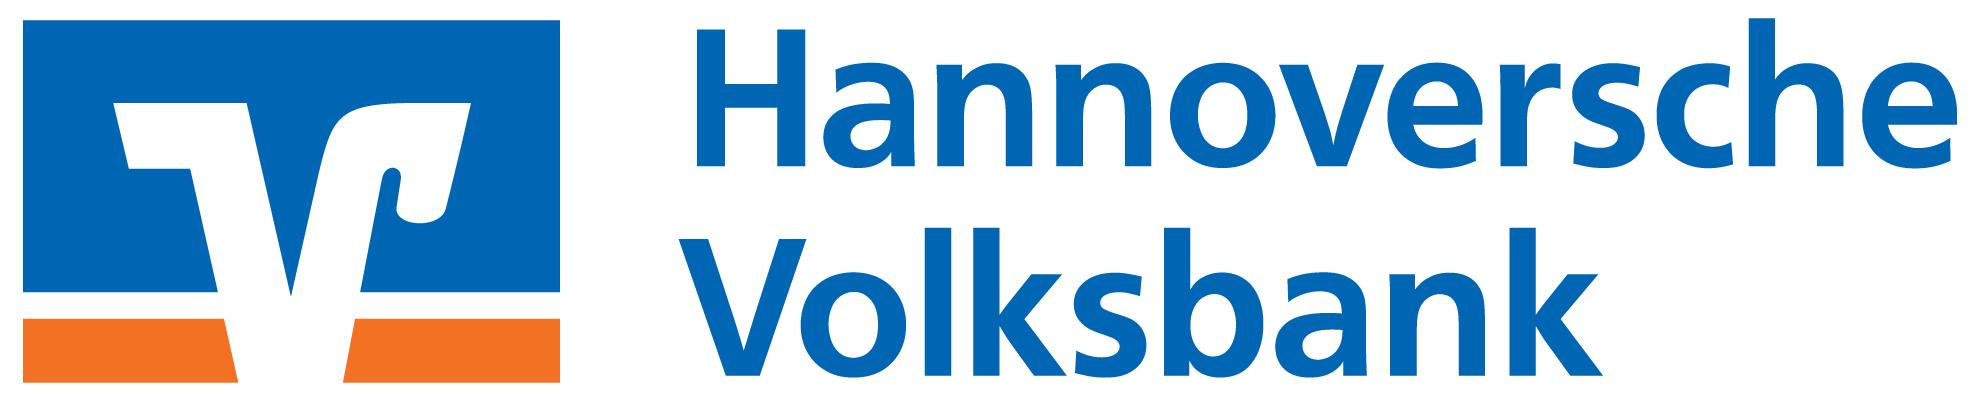 Hannoversche Volksbank eG BeratungsCenter Letter